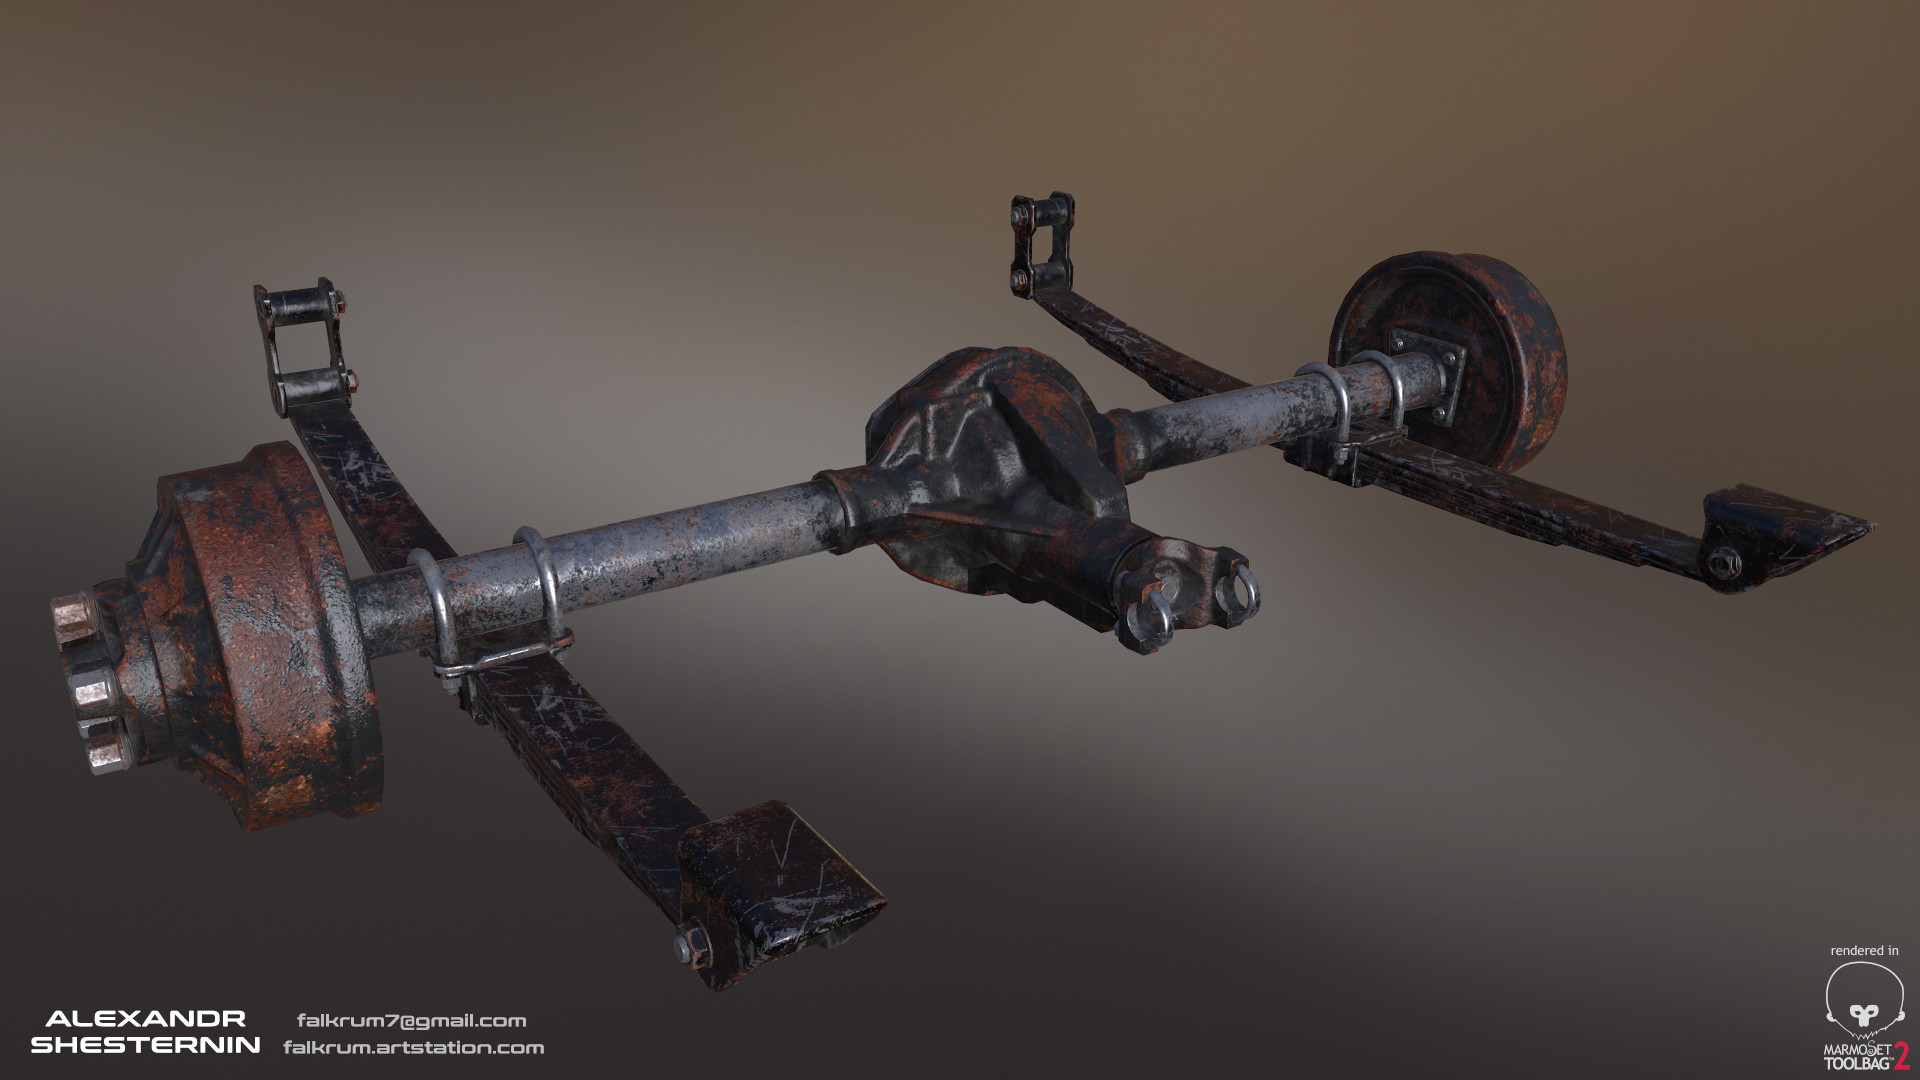 Alexandr shesternin rear axle03